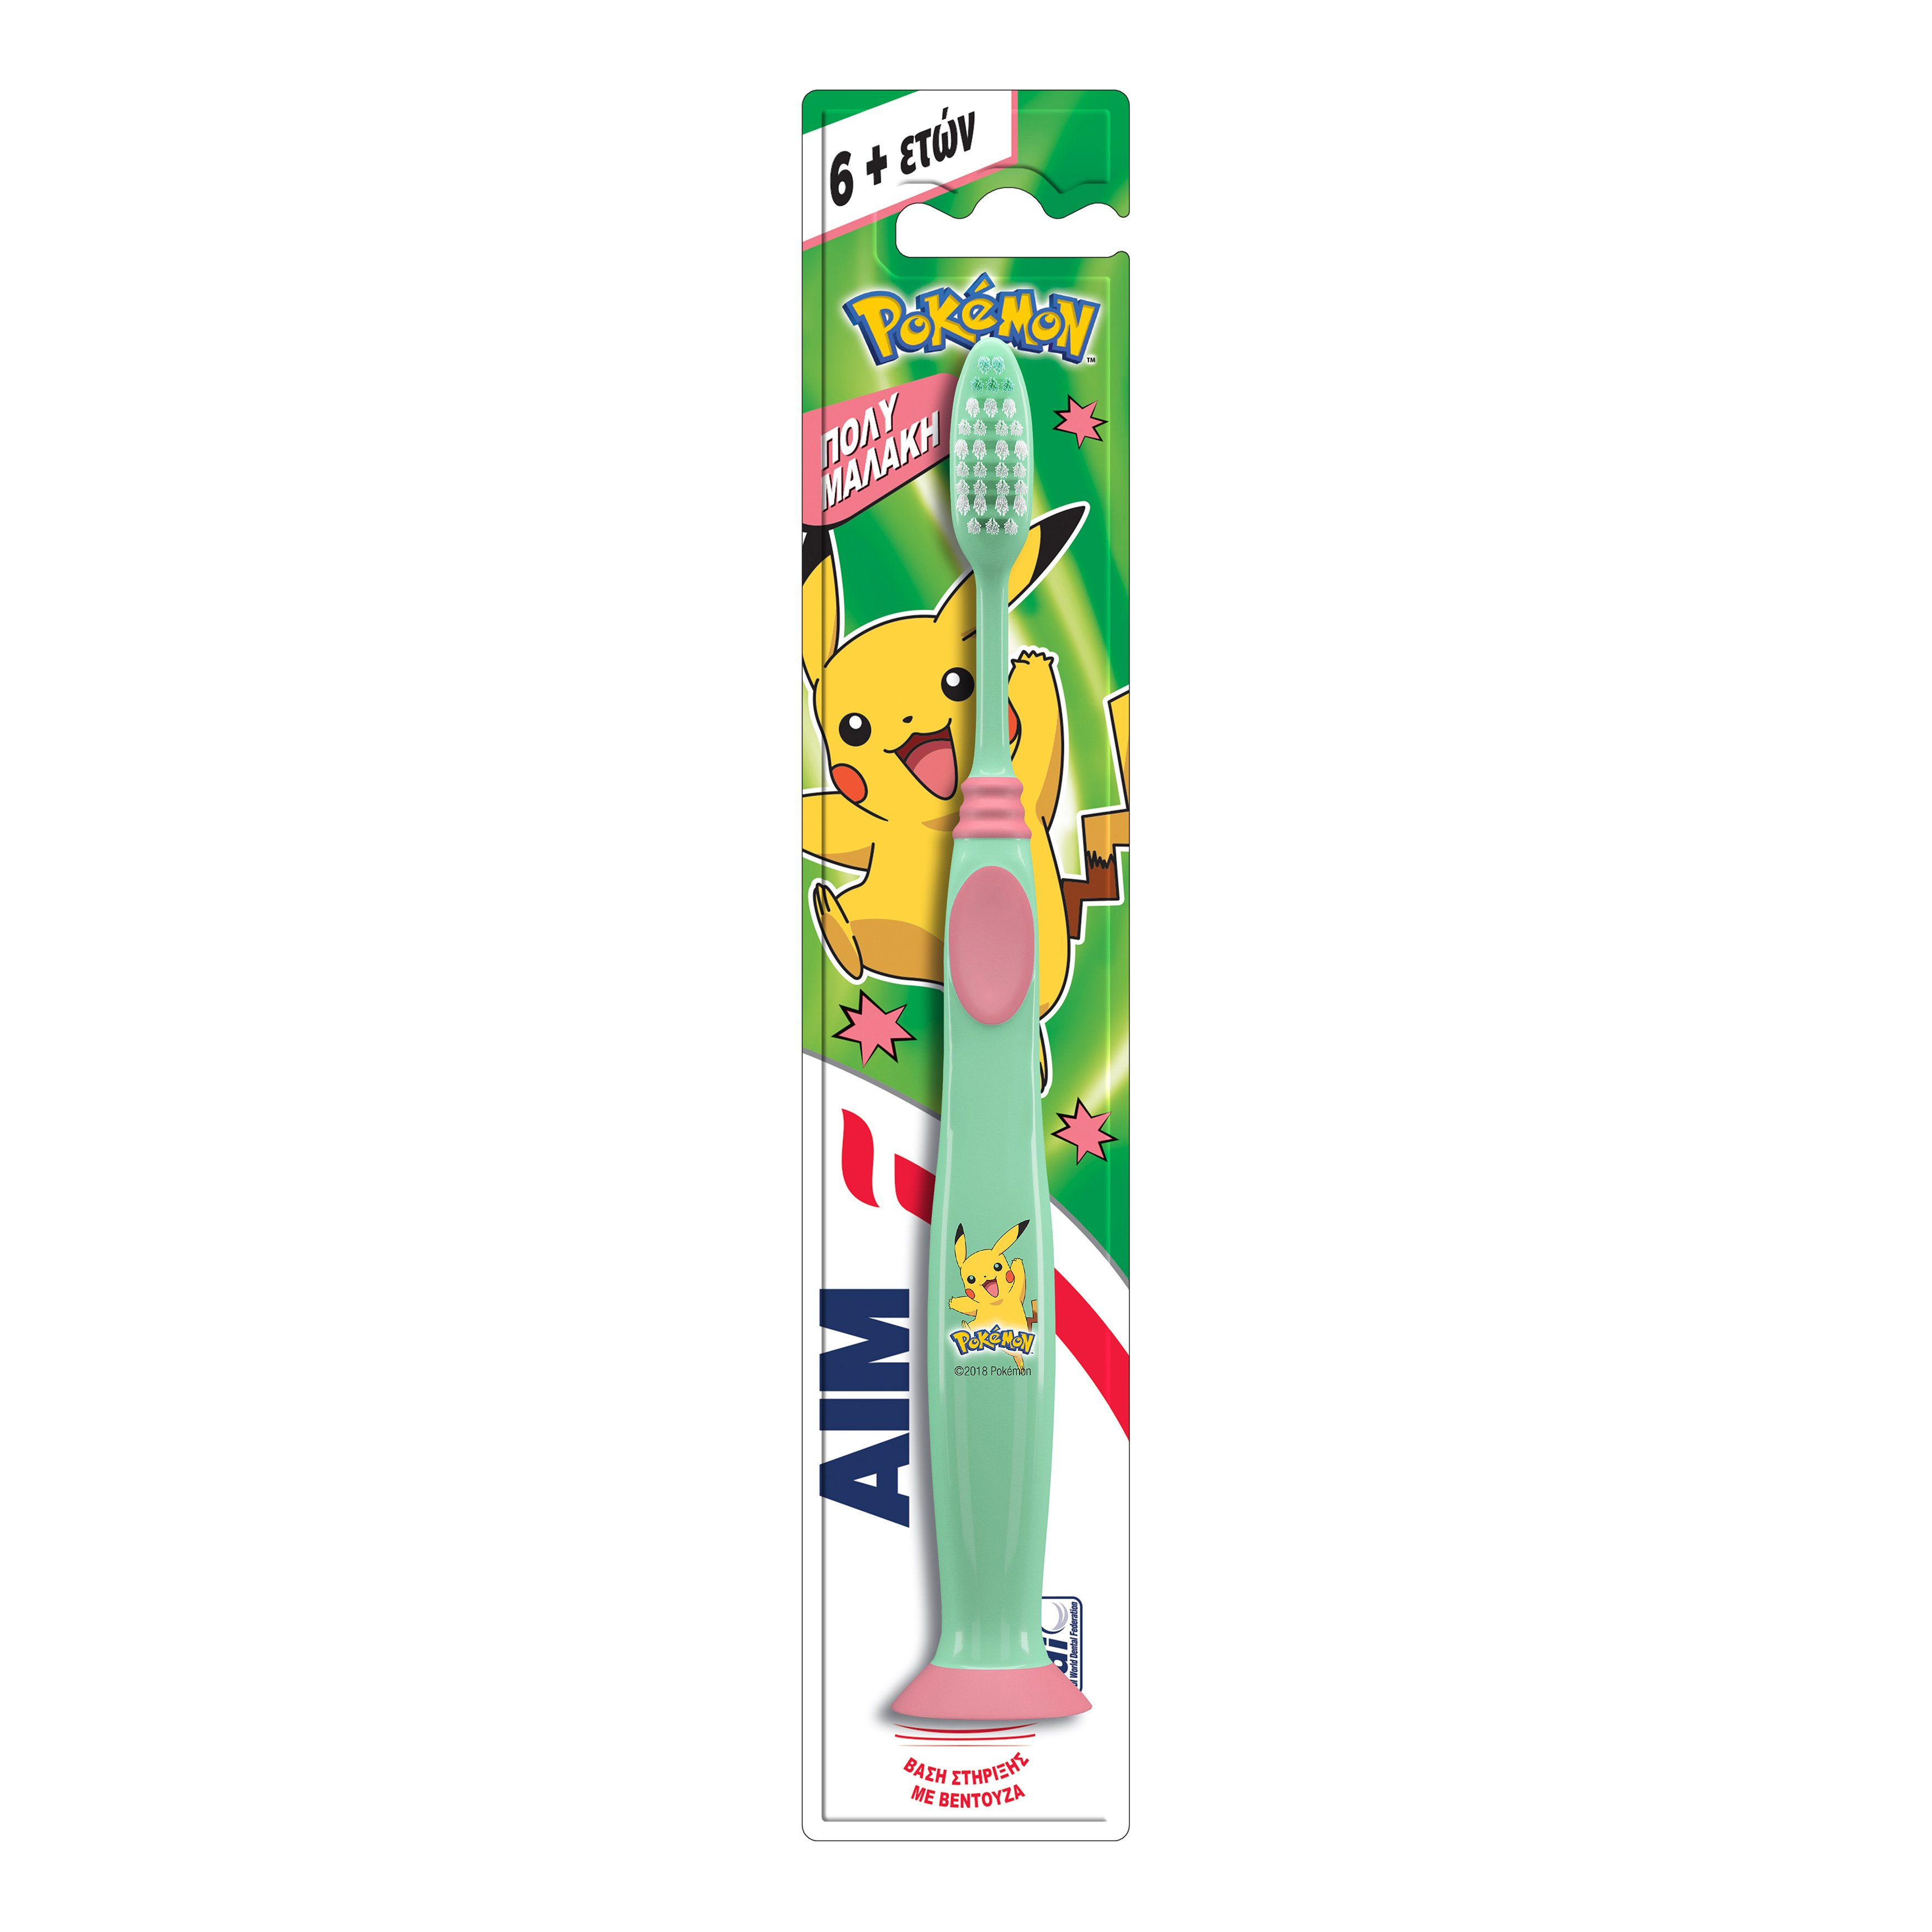 Aim Kids Pokemon Soft Παιδική Οδοντόβουρτσα Πολύ Μαλακή με Βάση Στήριξης με Βεντούζα 6+ Ετών 1 Τεμάχιο – πράσινο